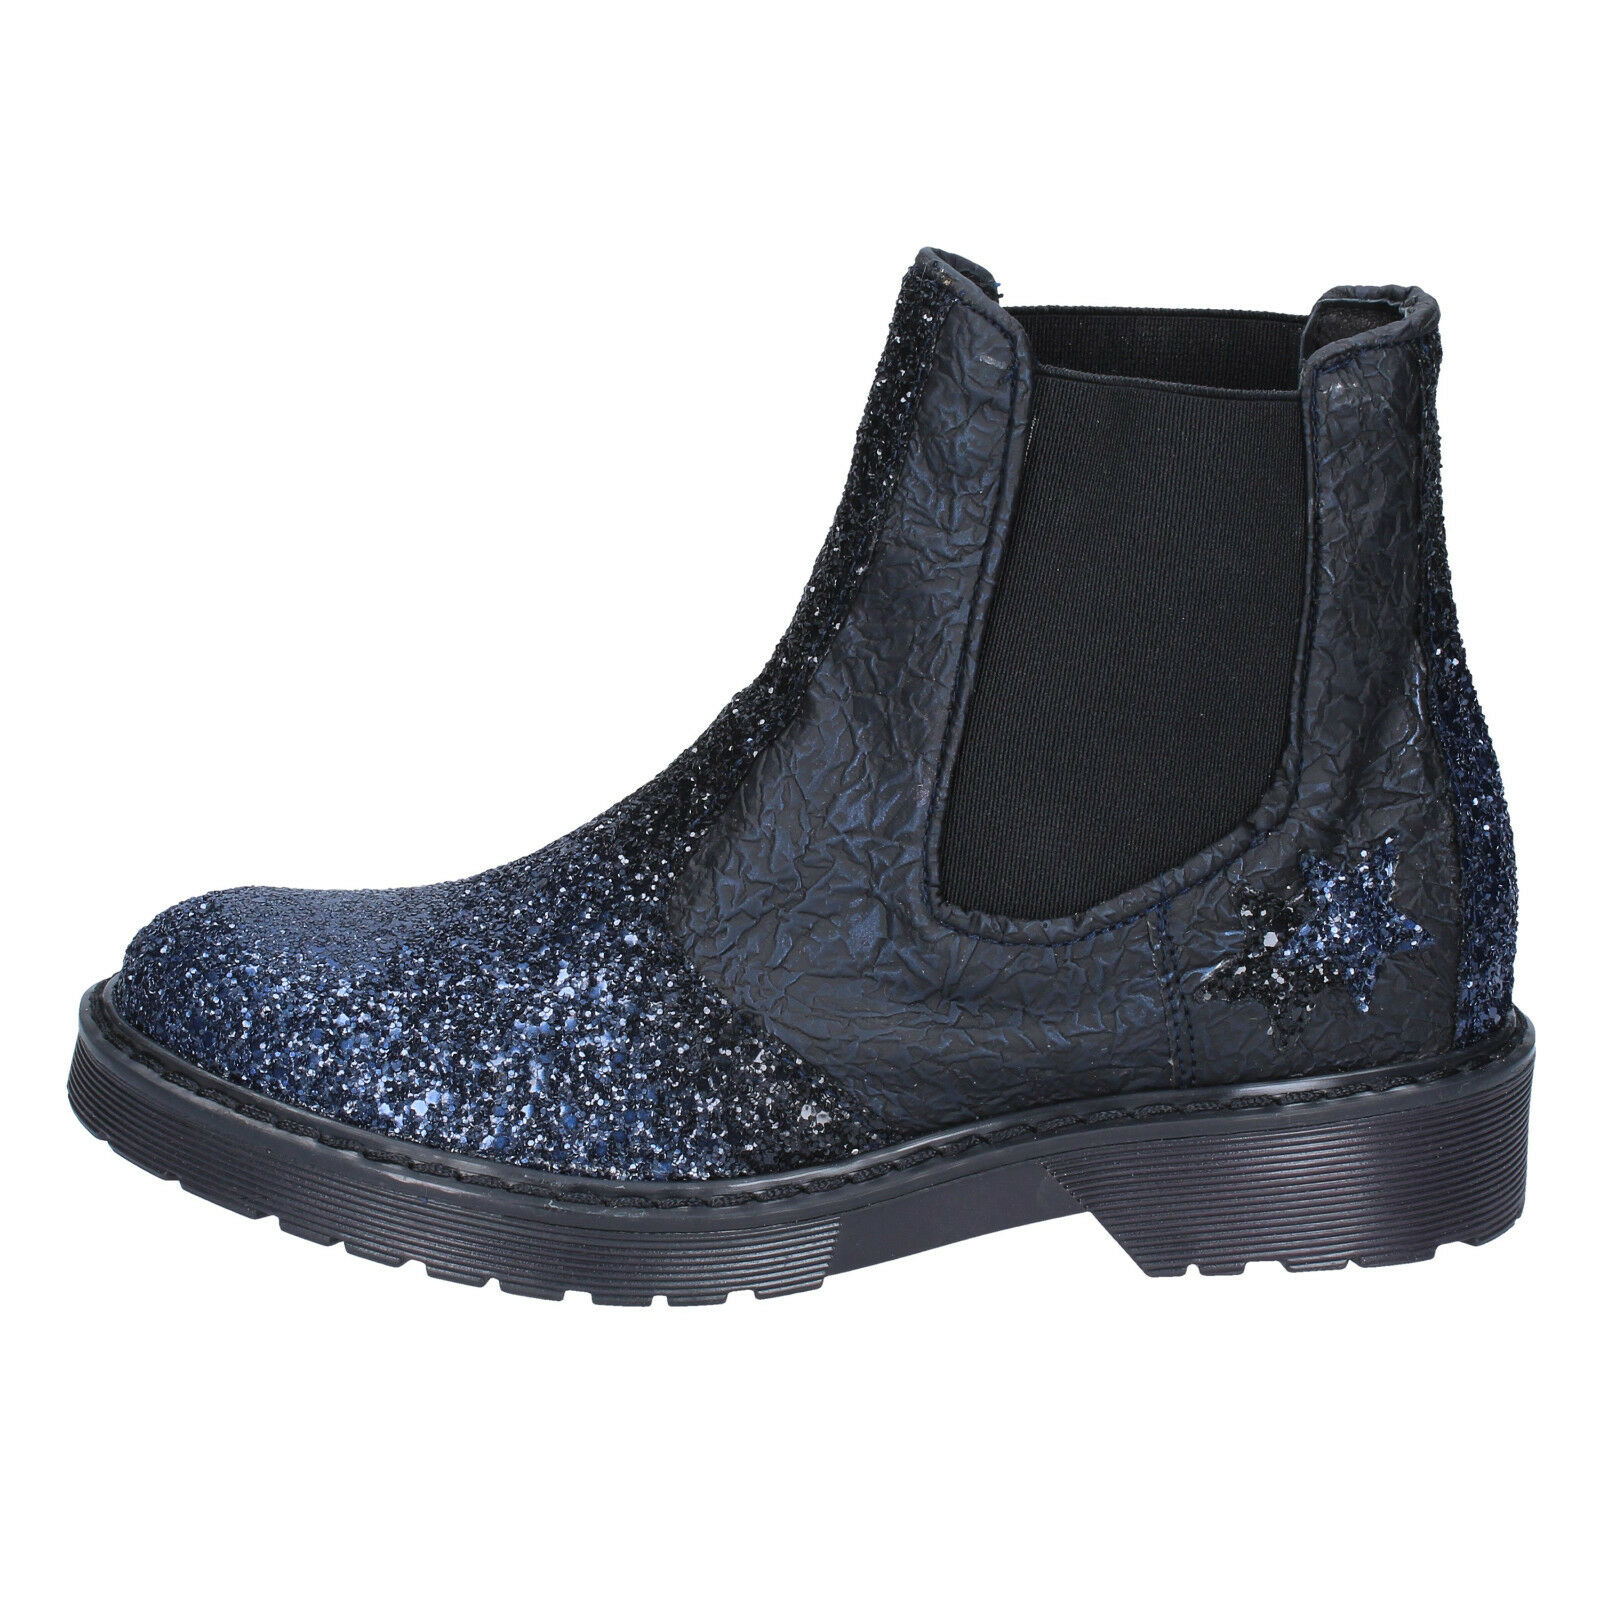 Damenschuhe schuhe 2 STAR 4 Blau (EU 37) ankle Stiefel Blau 4 schwarz Leder glitter BX375-37 c39391